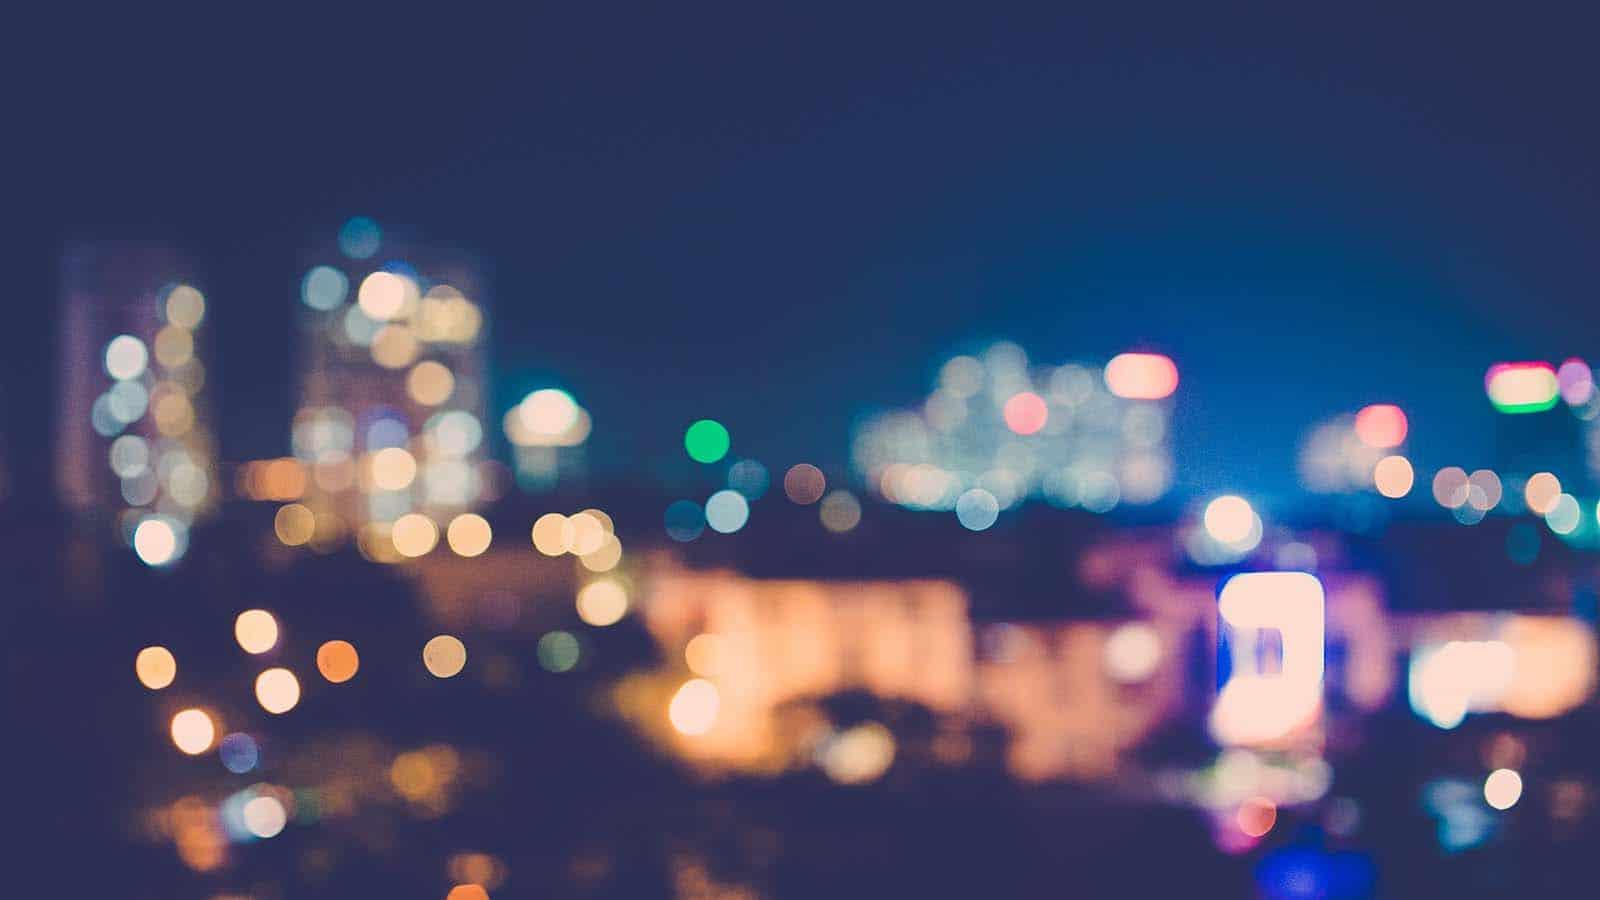 Blurred cityscape night image